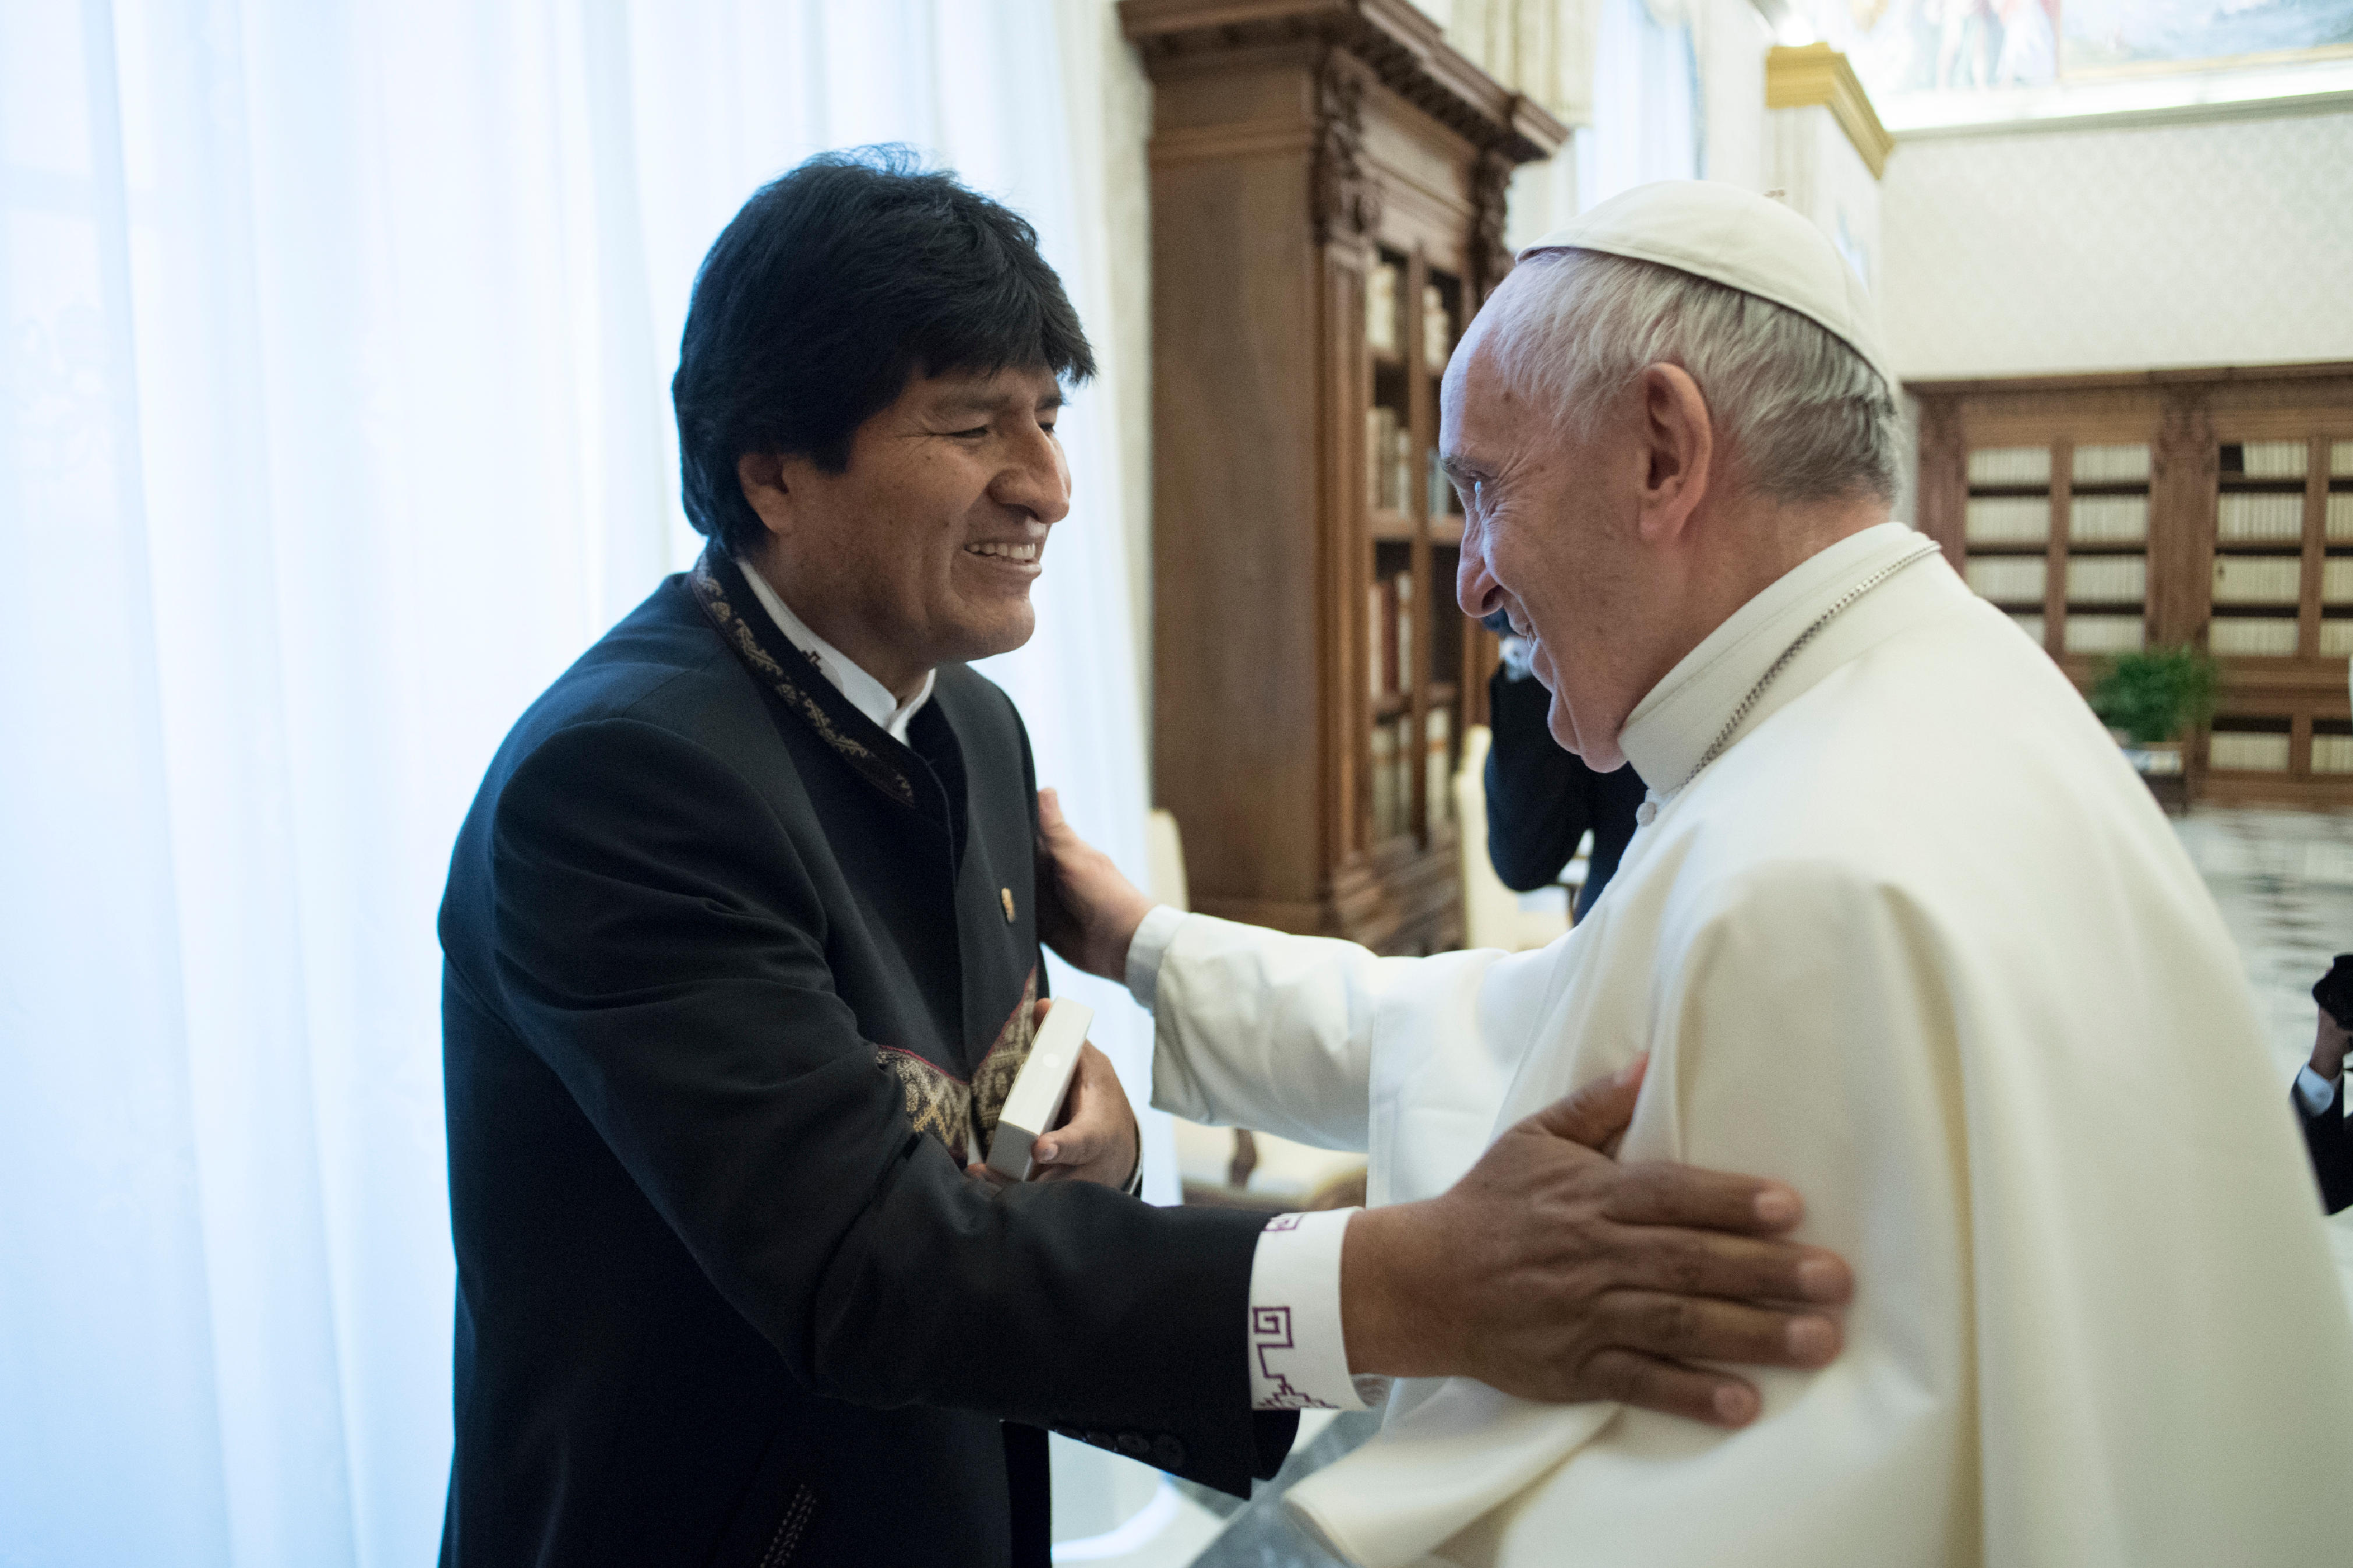 Président Evo Morales, Bolivie © L'Osservatore Romano